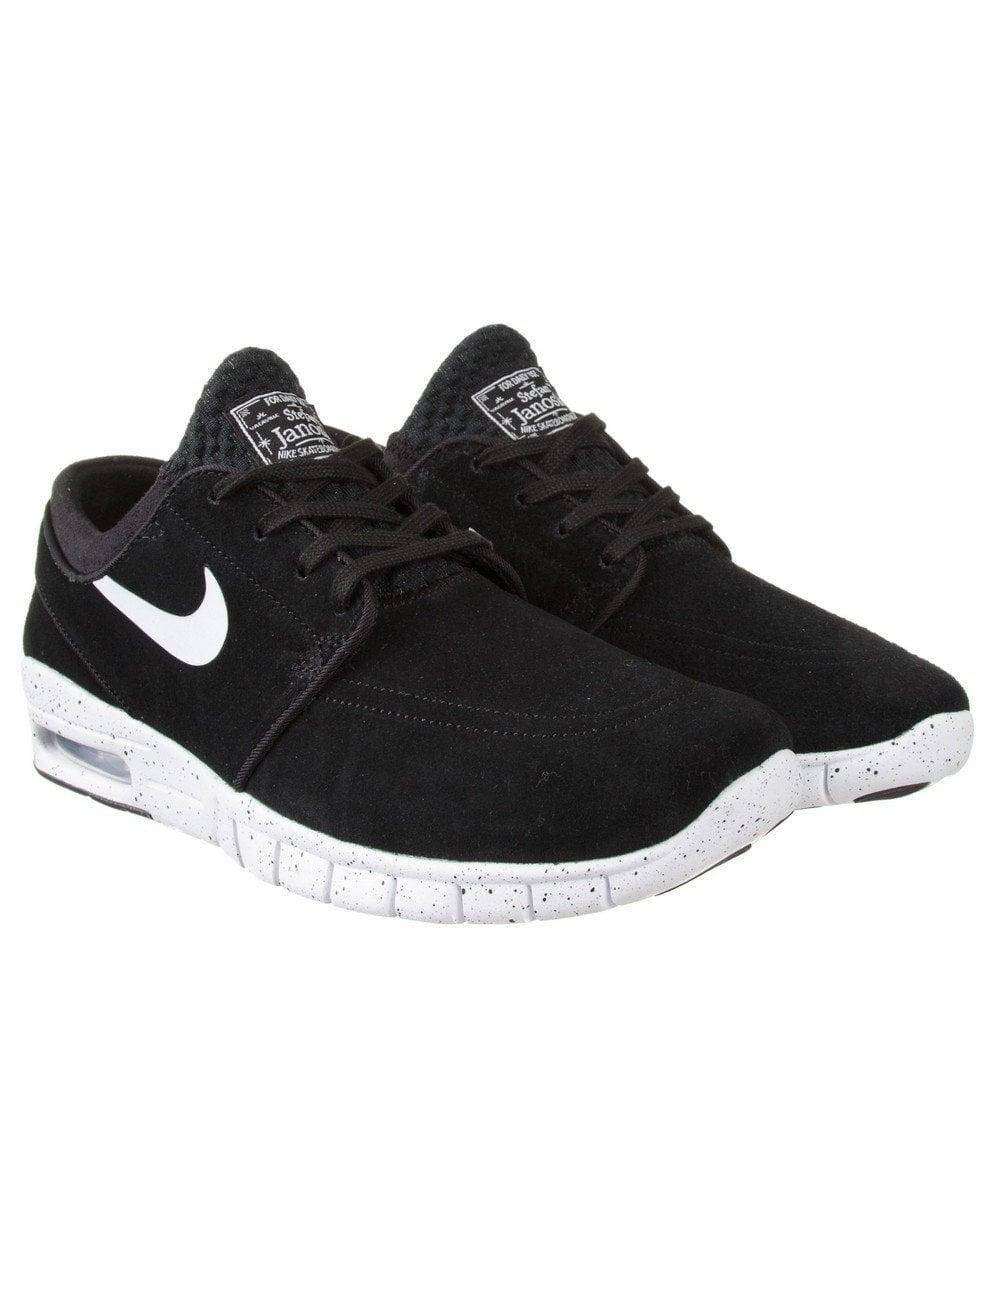 1ee226b499e8 Nike SB Stefan Janoski Max Suede - Black - Footwear from Fat Buddha ...